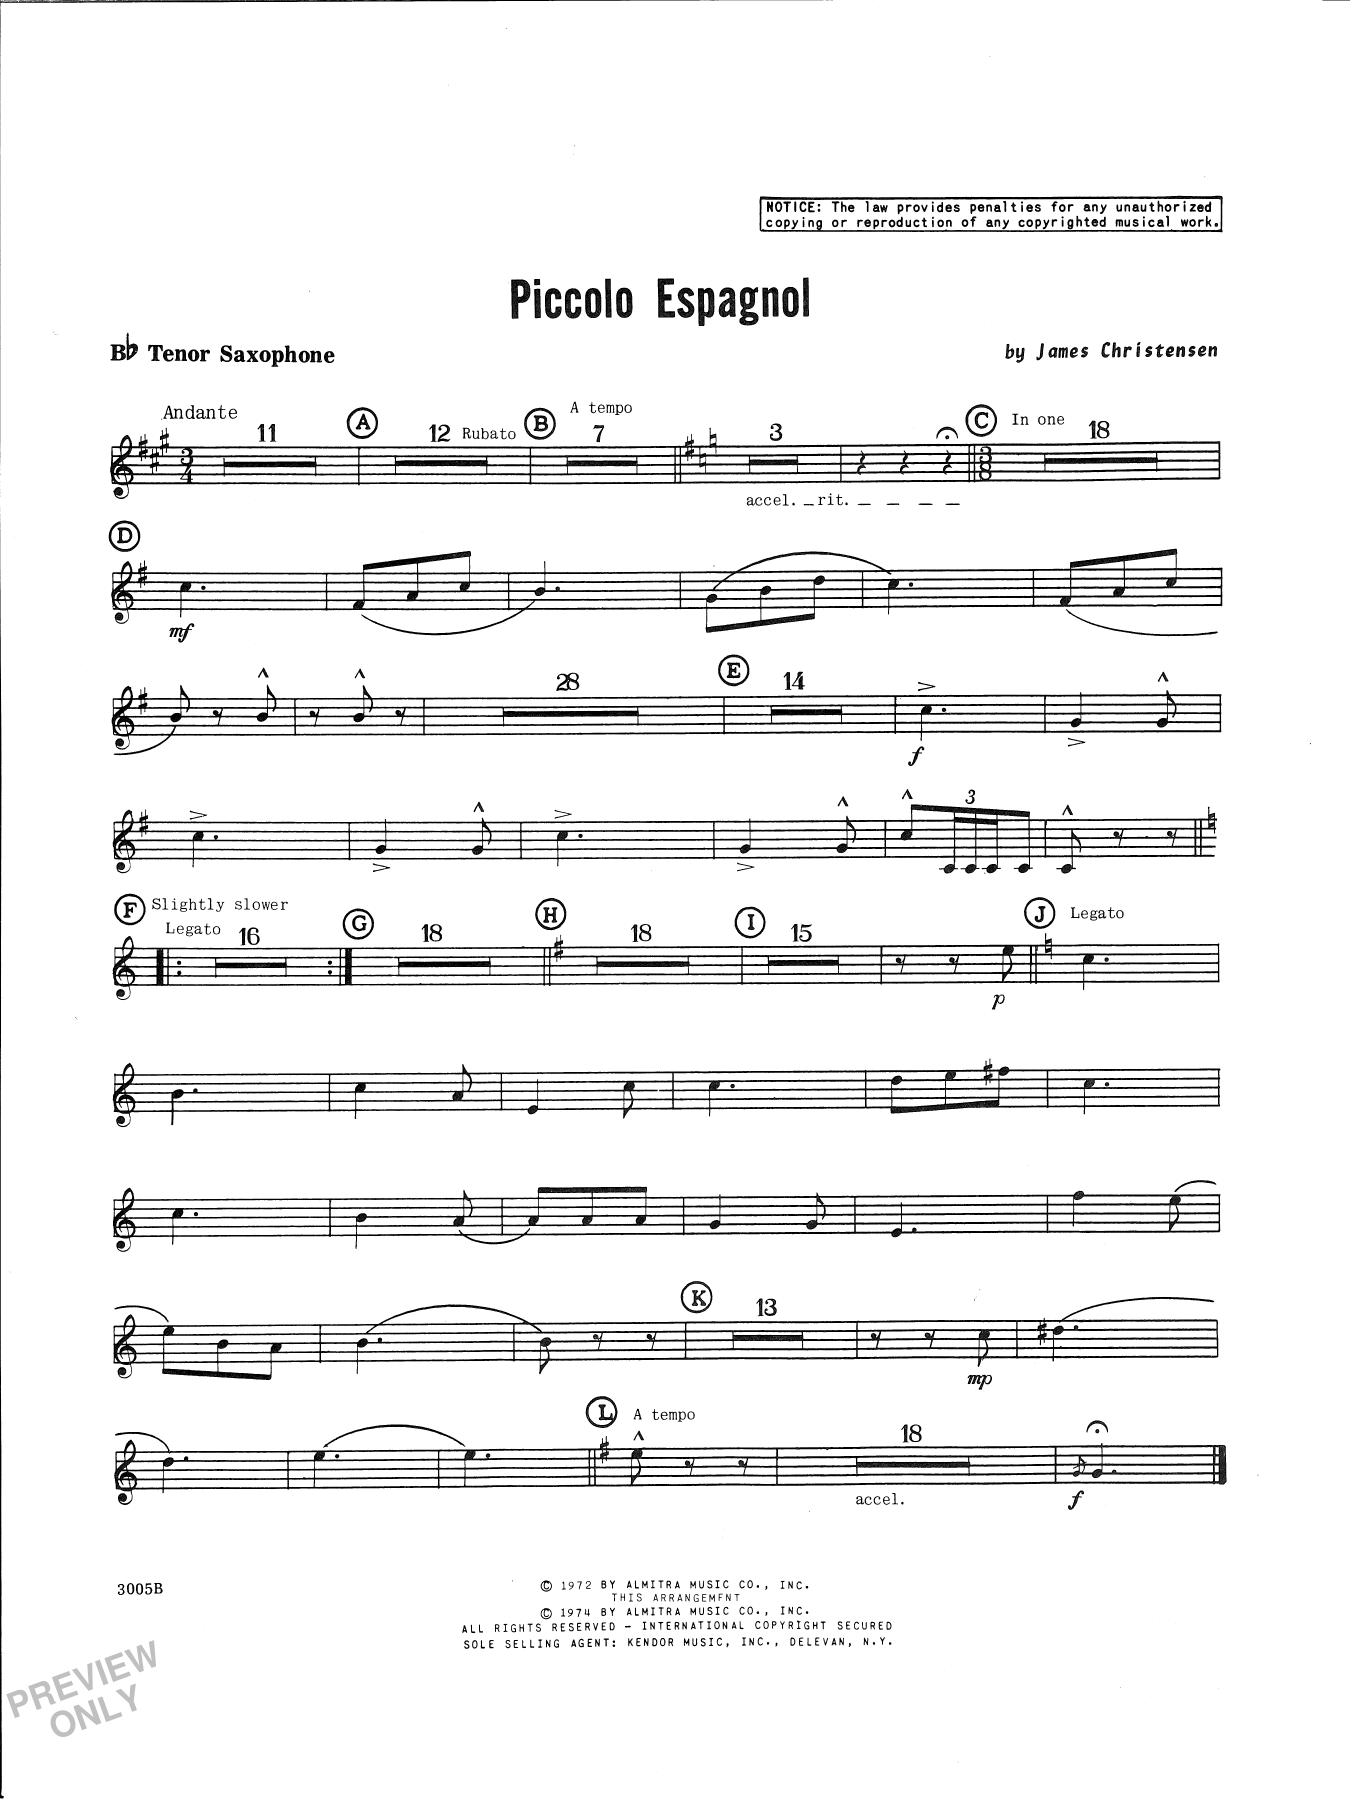 James Christensen Piccolo Espagnol - Bb Tenor Saxophone sheet music notes and chords. Download Printable PDF.